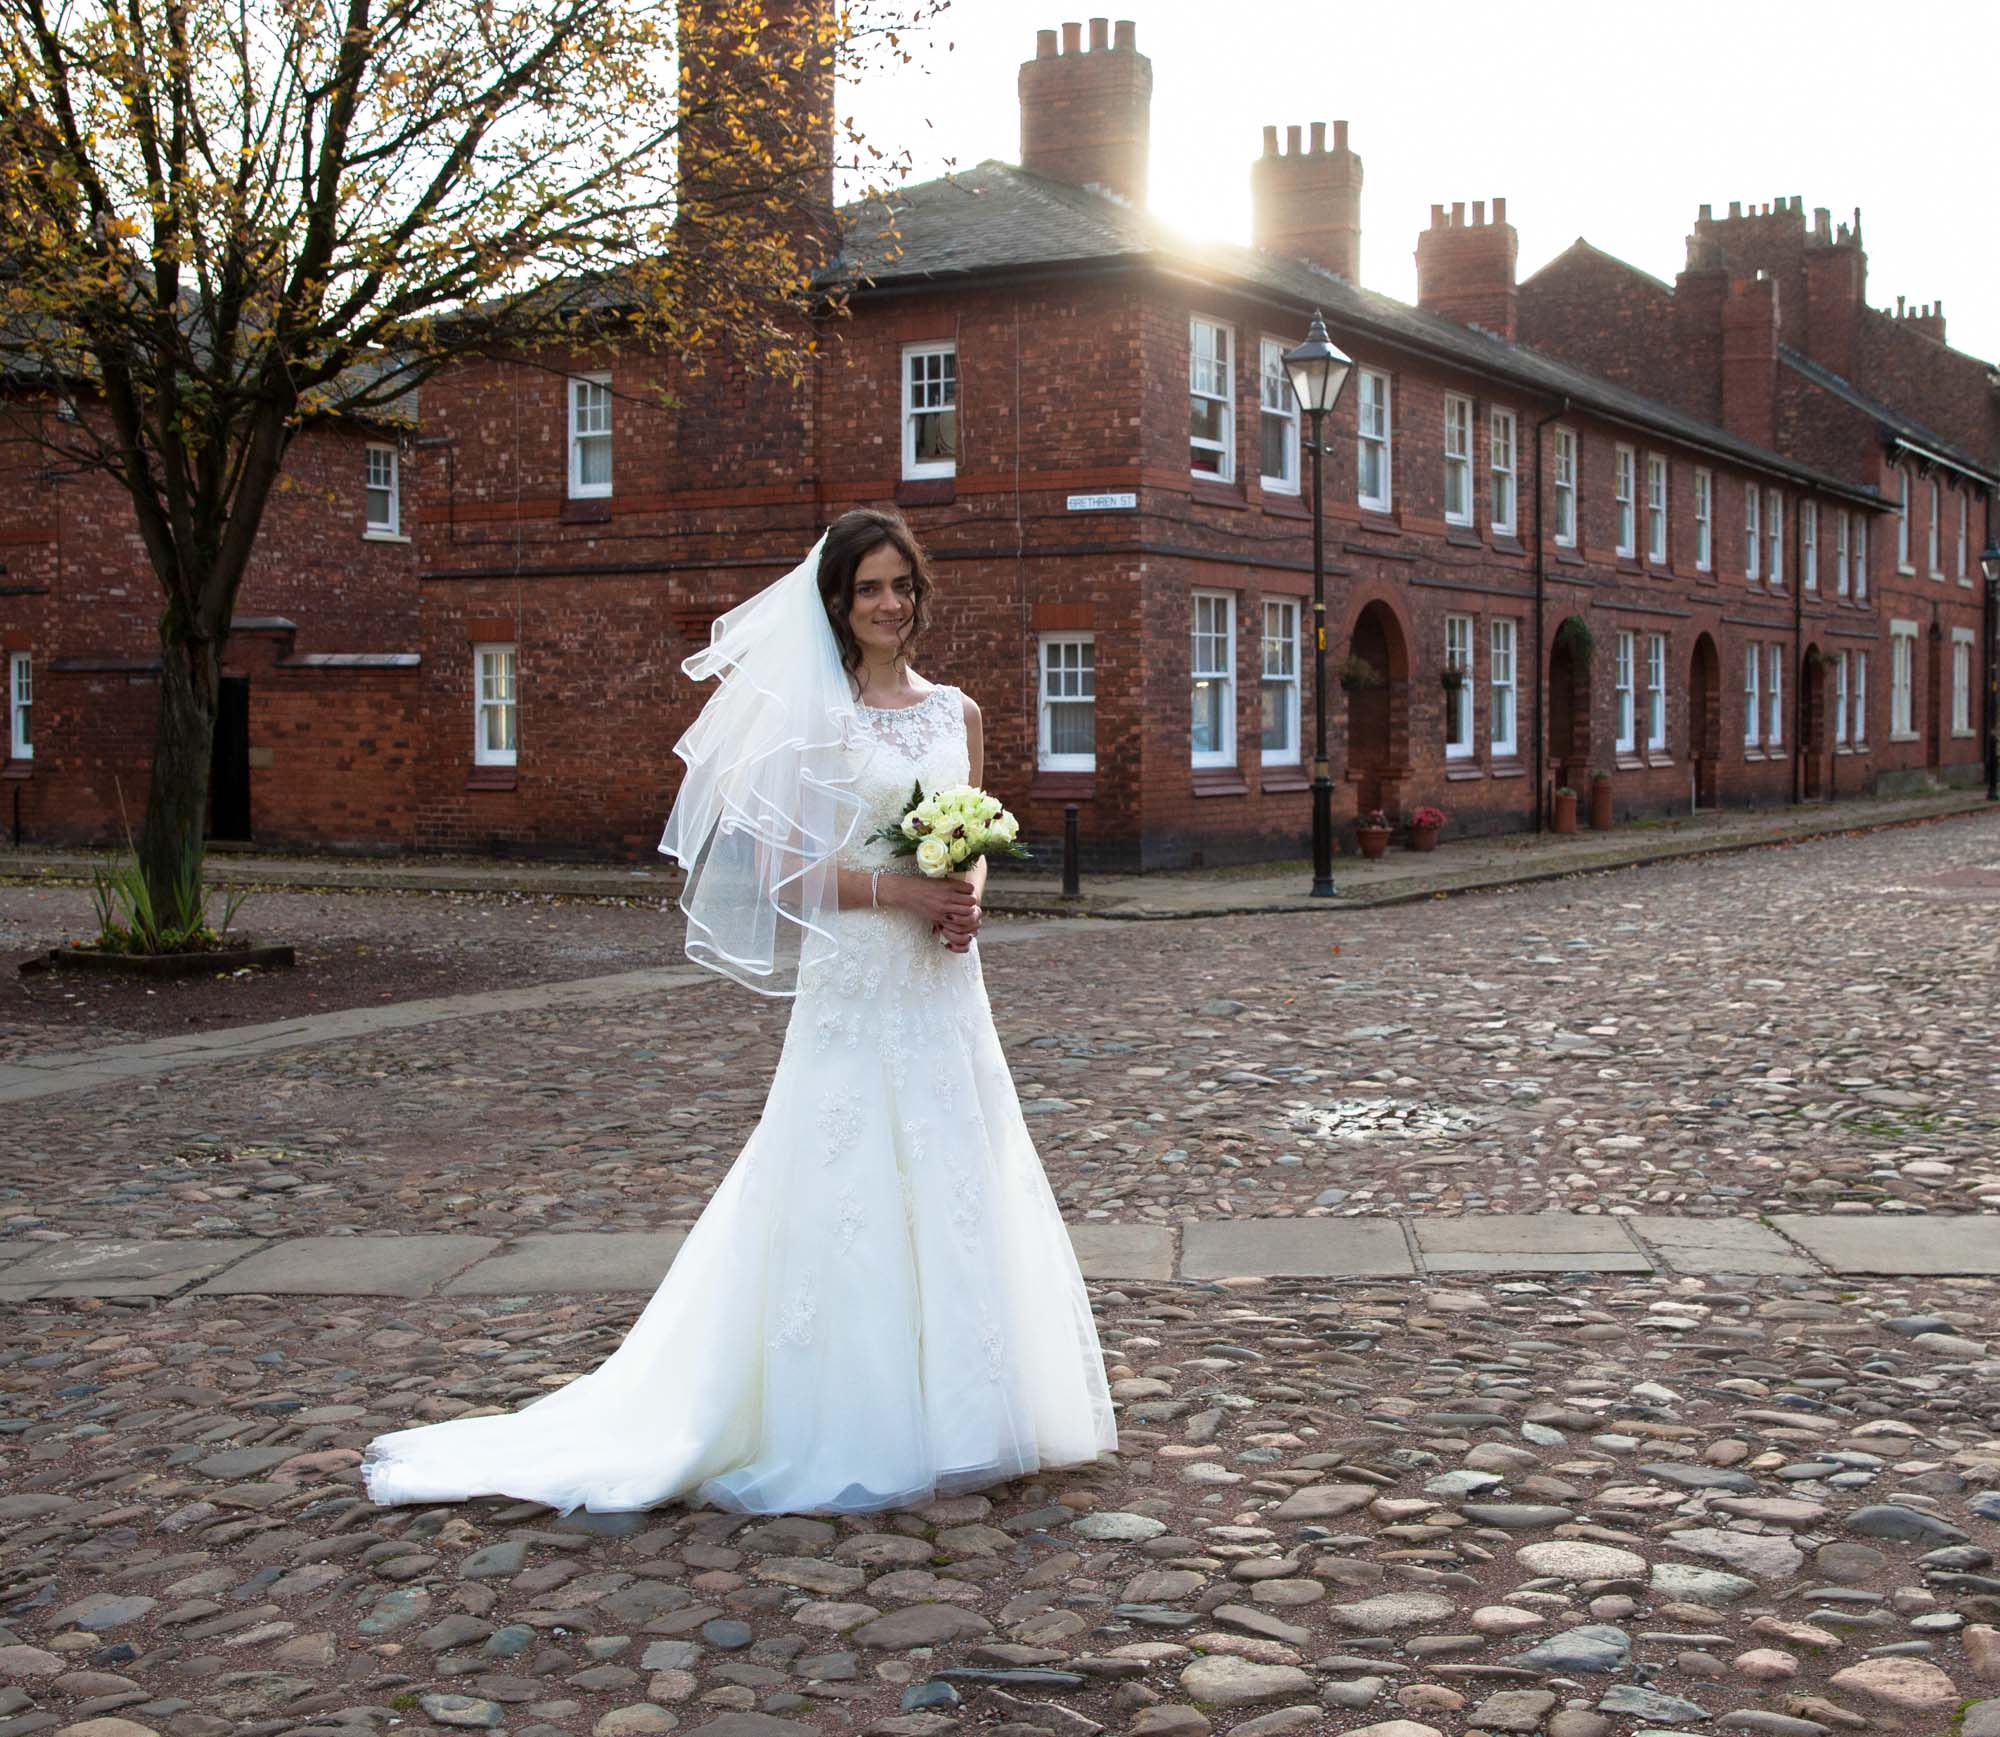 weddings-couples-love-photographer-oxford-london-jonathan-self-photography-58.jpg